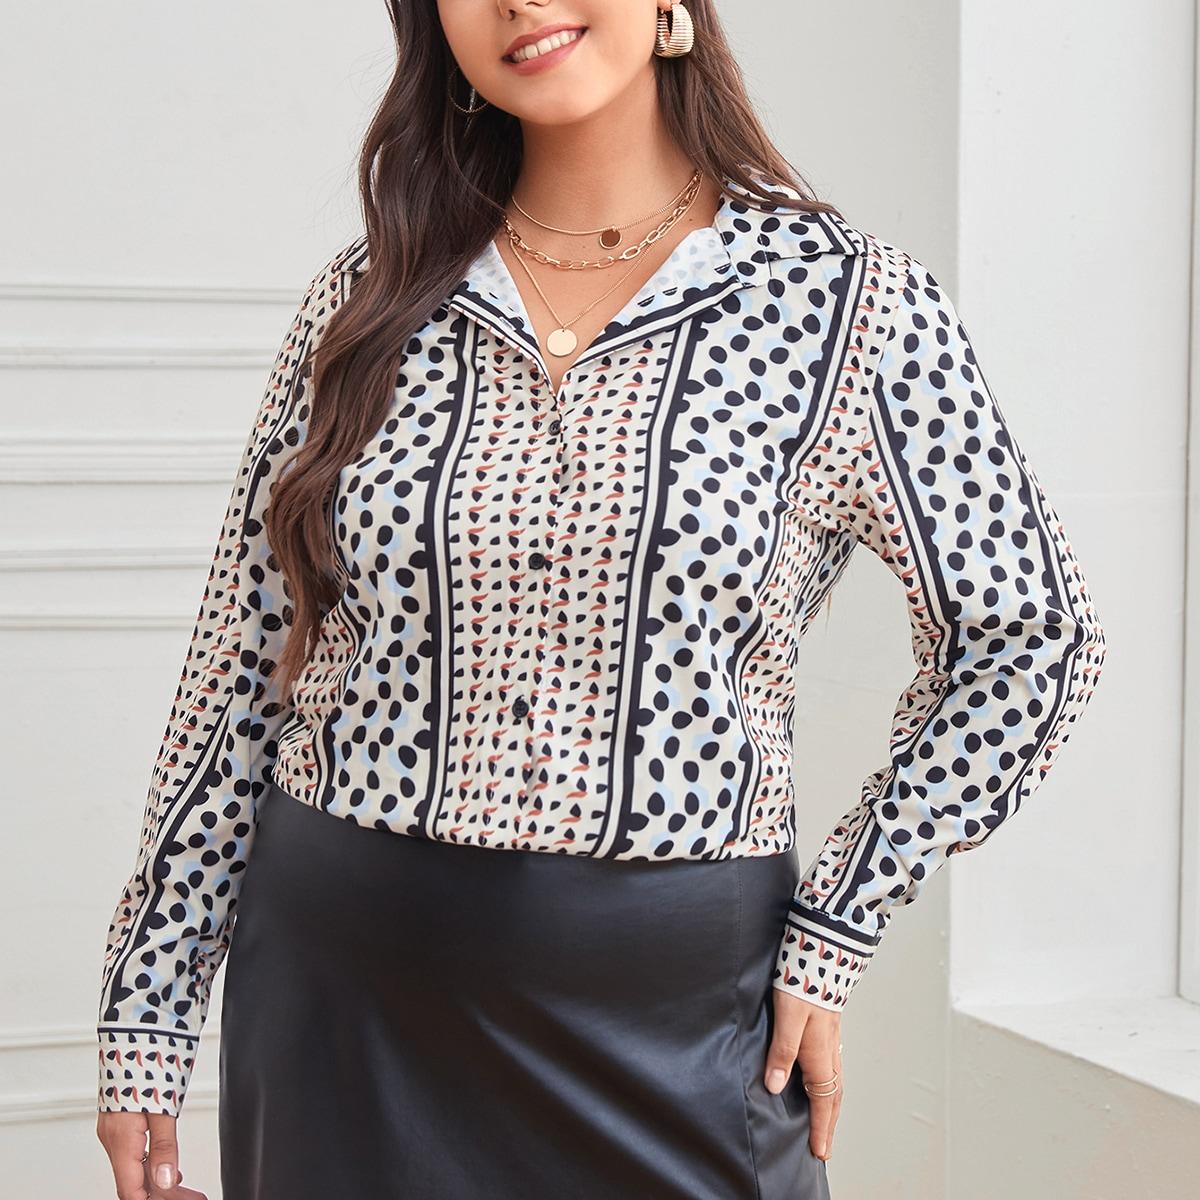 Plus Striped & Polka Dot Print Blouse, SHEIN  - buy with discount